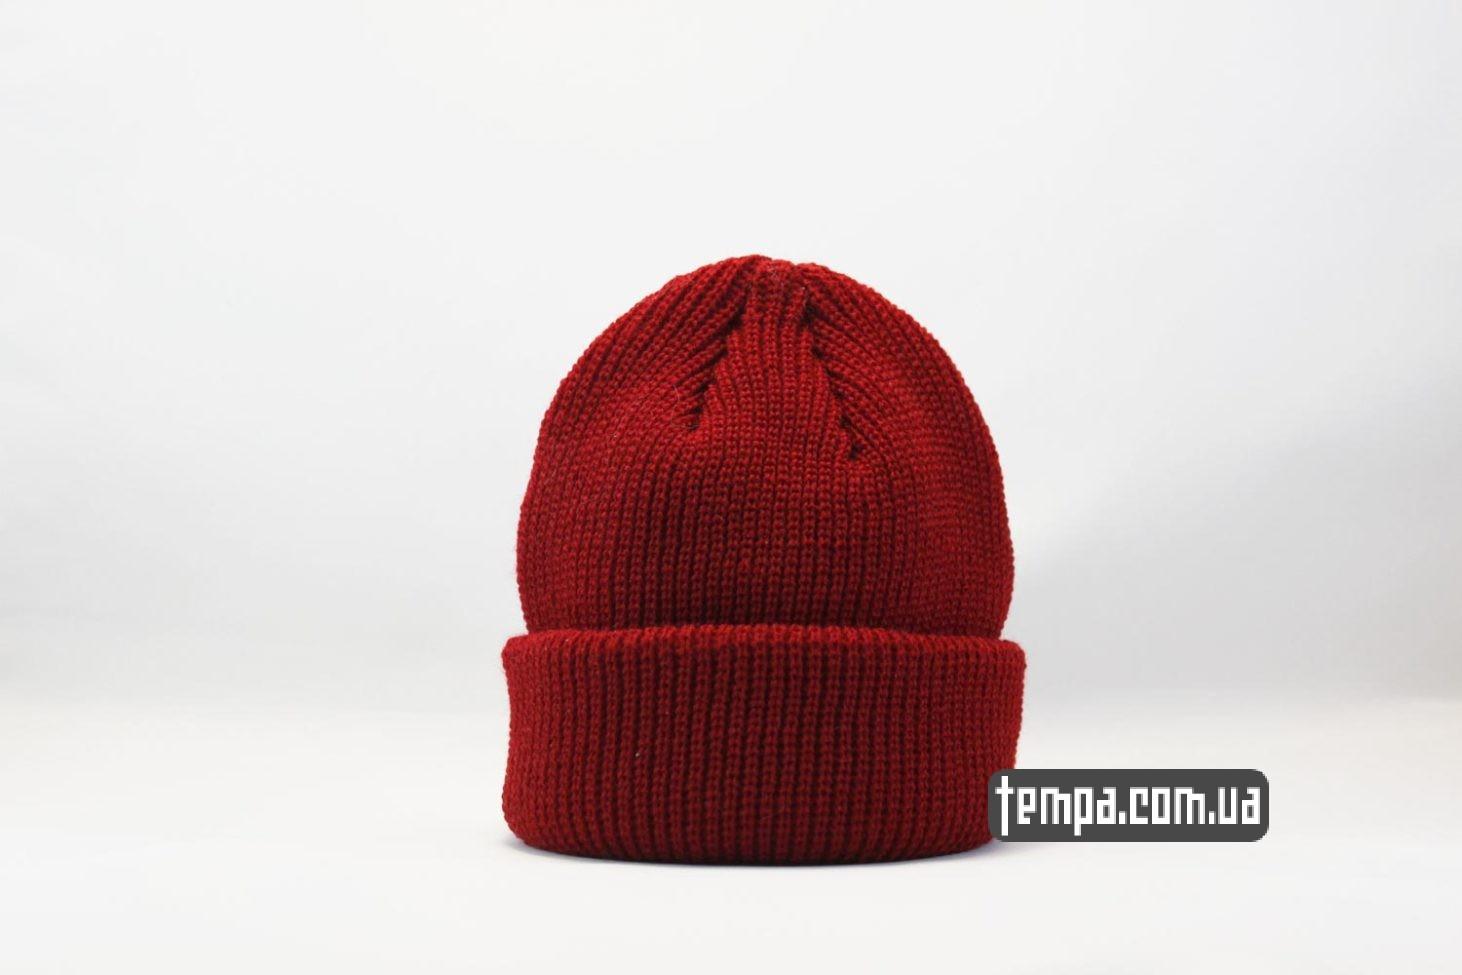 шапка как у монатика шапка beanie monatik ASOS красная коротка шапка